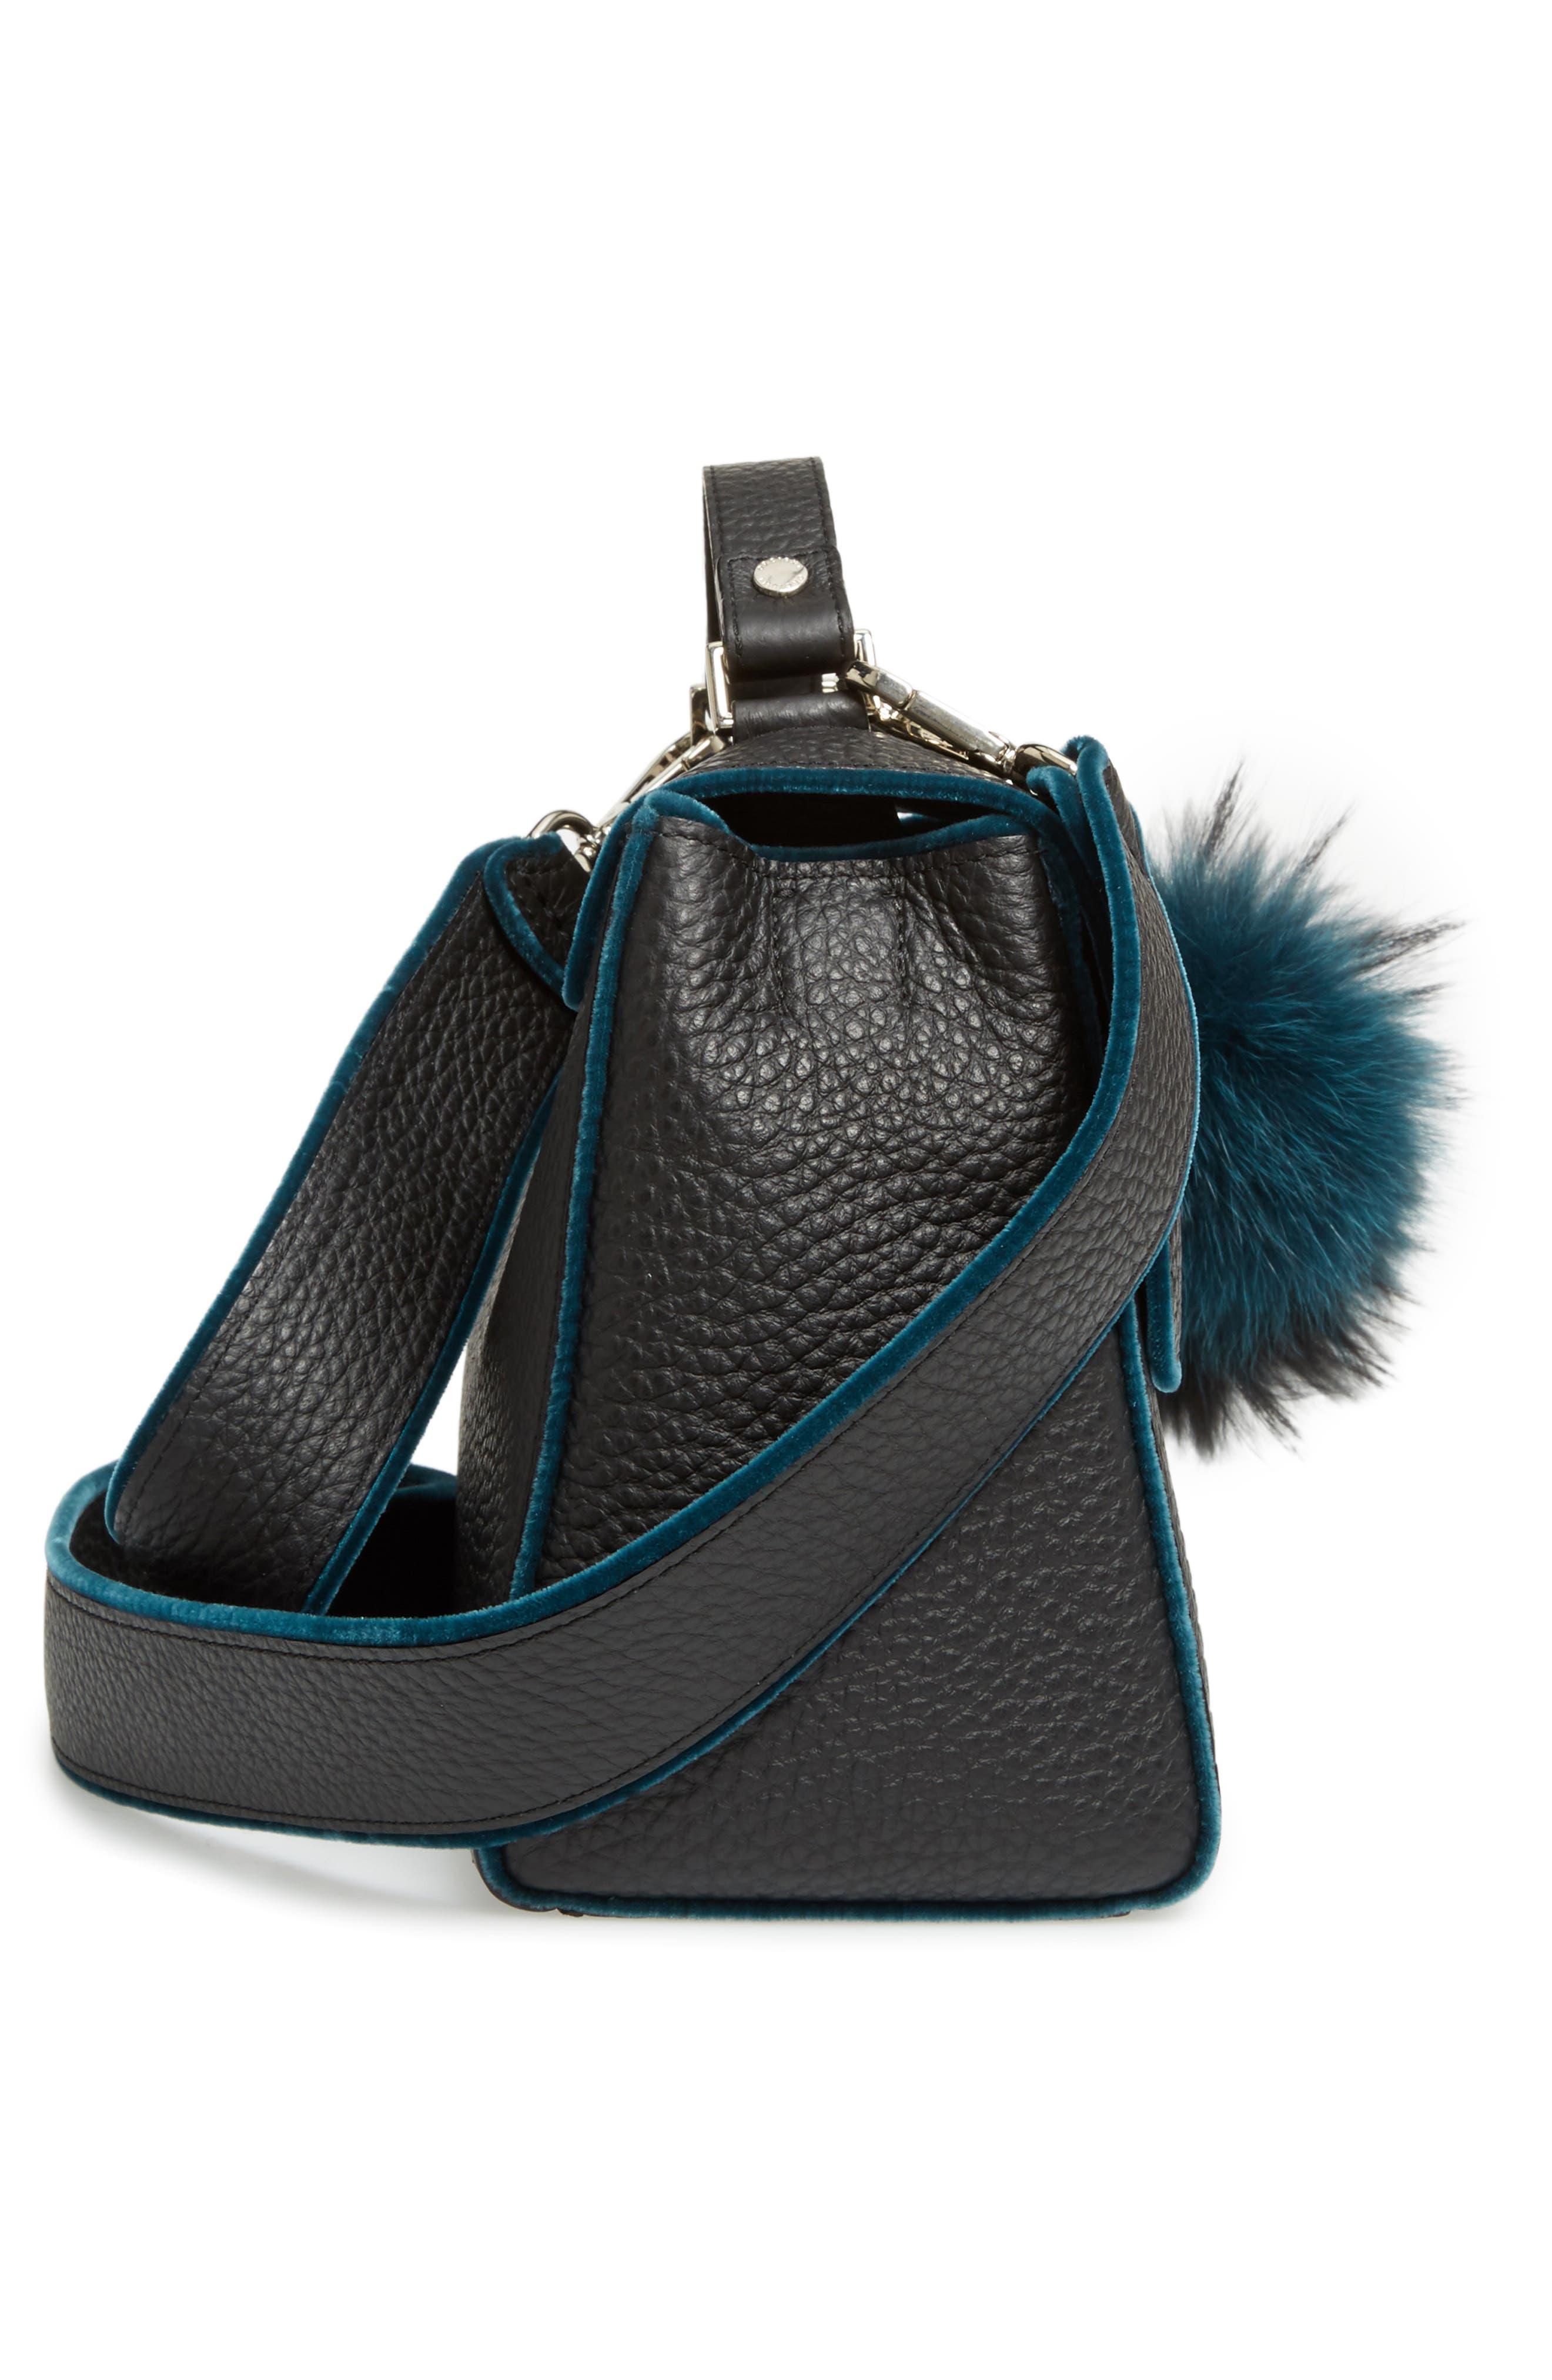 Small Sveva Soft Leather Top Handle Satchel with Genuine Fur Bag Charm,                             Alternate thumbnail 5, color,                             300